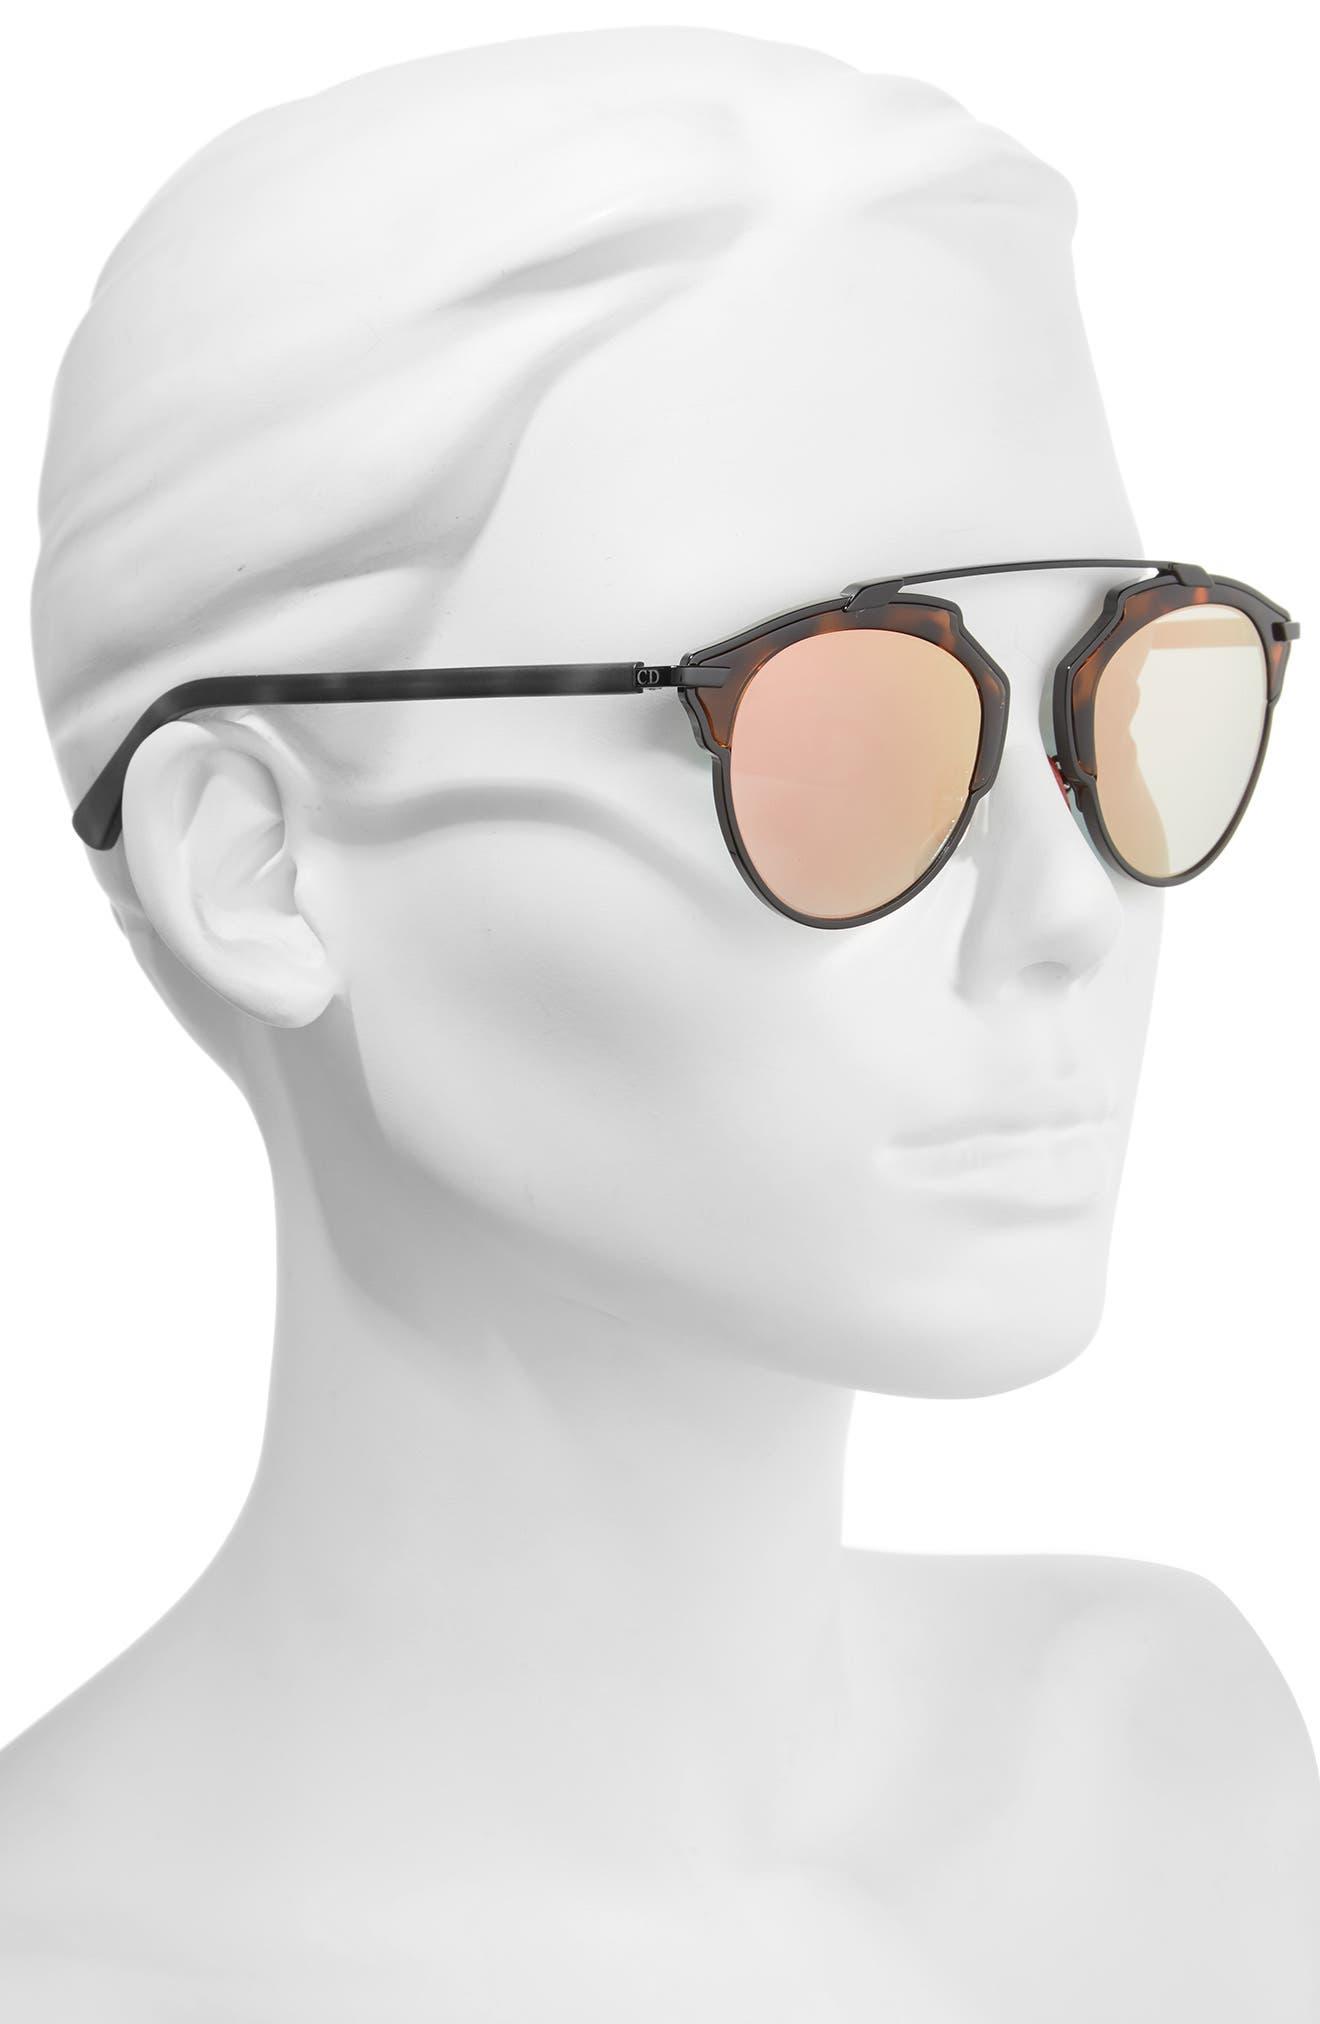 So Real 48mm Brow Bar Sunglasses,                             Alternate thumbnail 31, color,